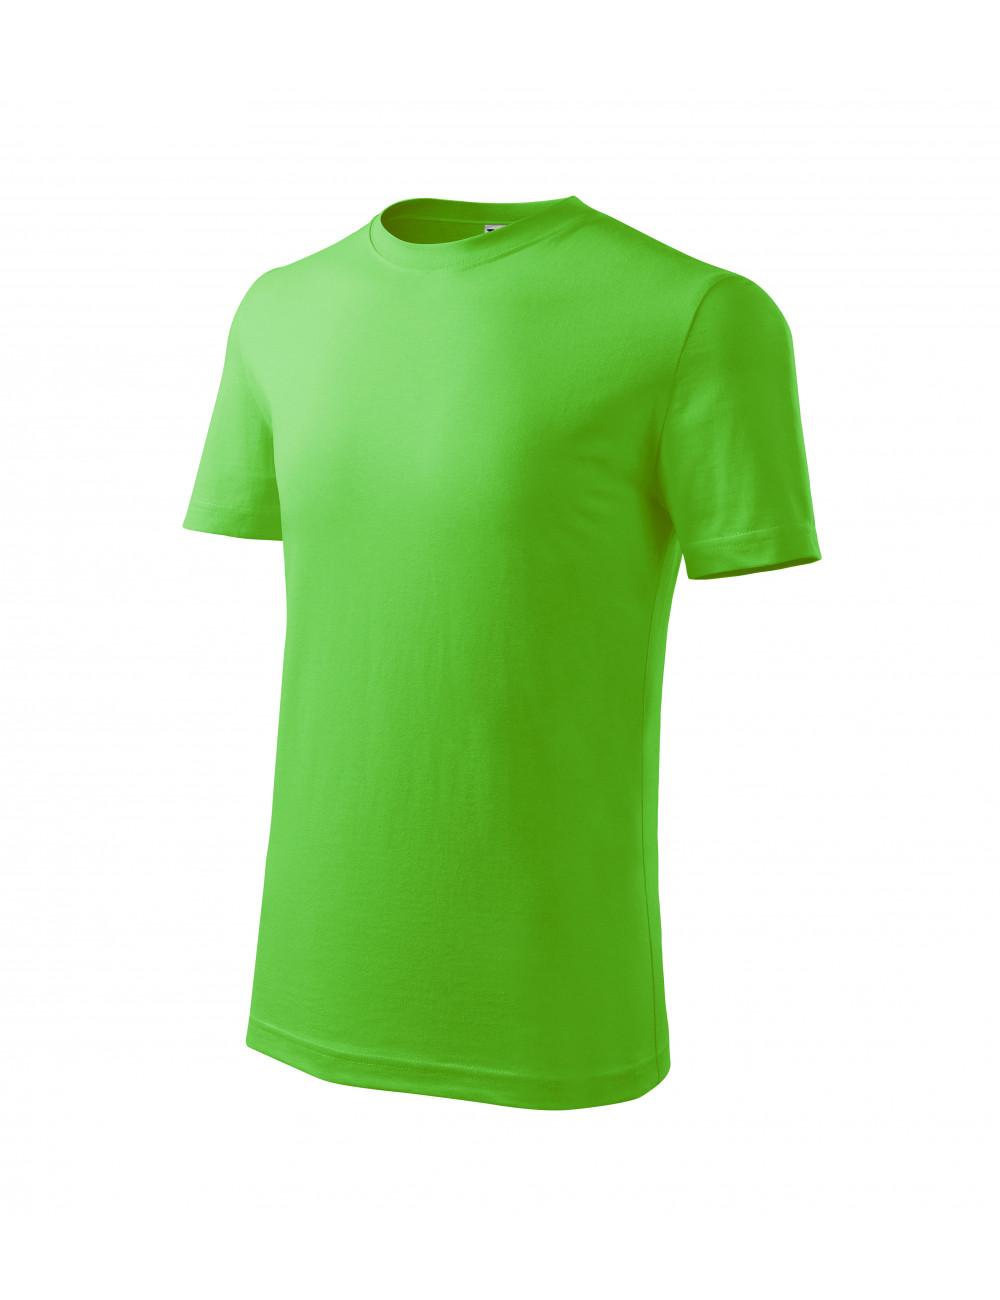 Adler MALFINI Koszulka dziecięca Classic New 135 green apple